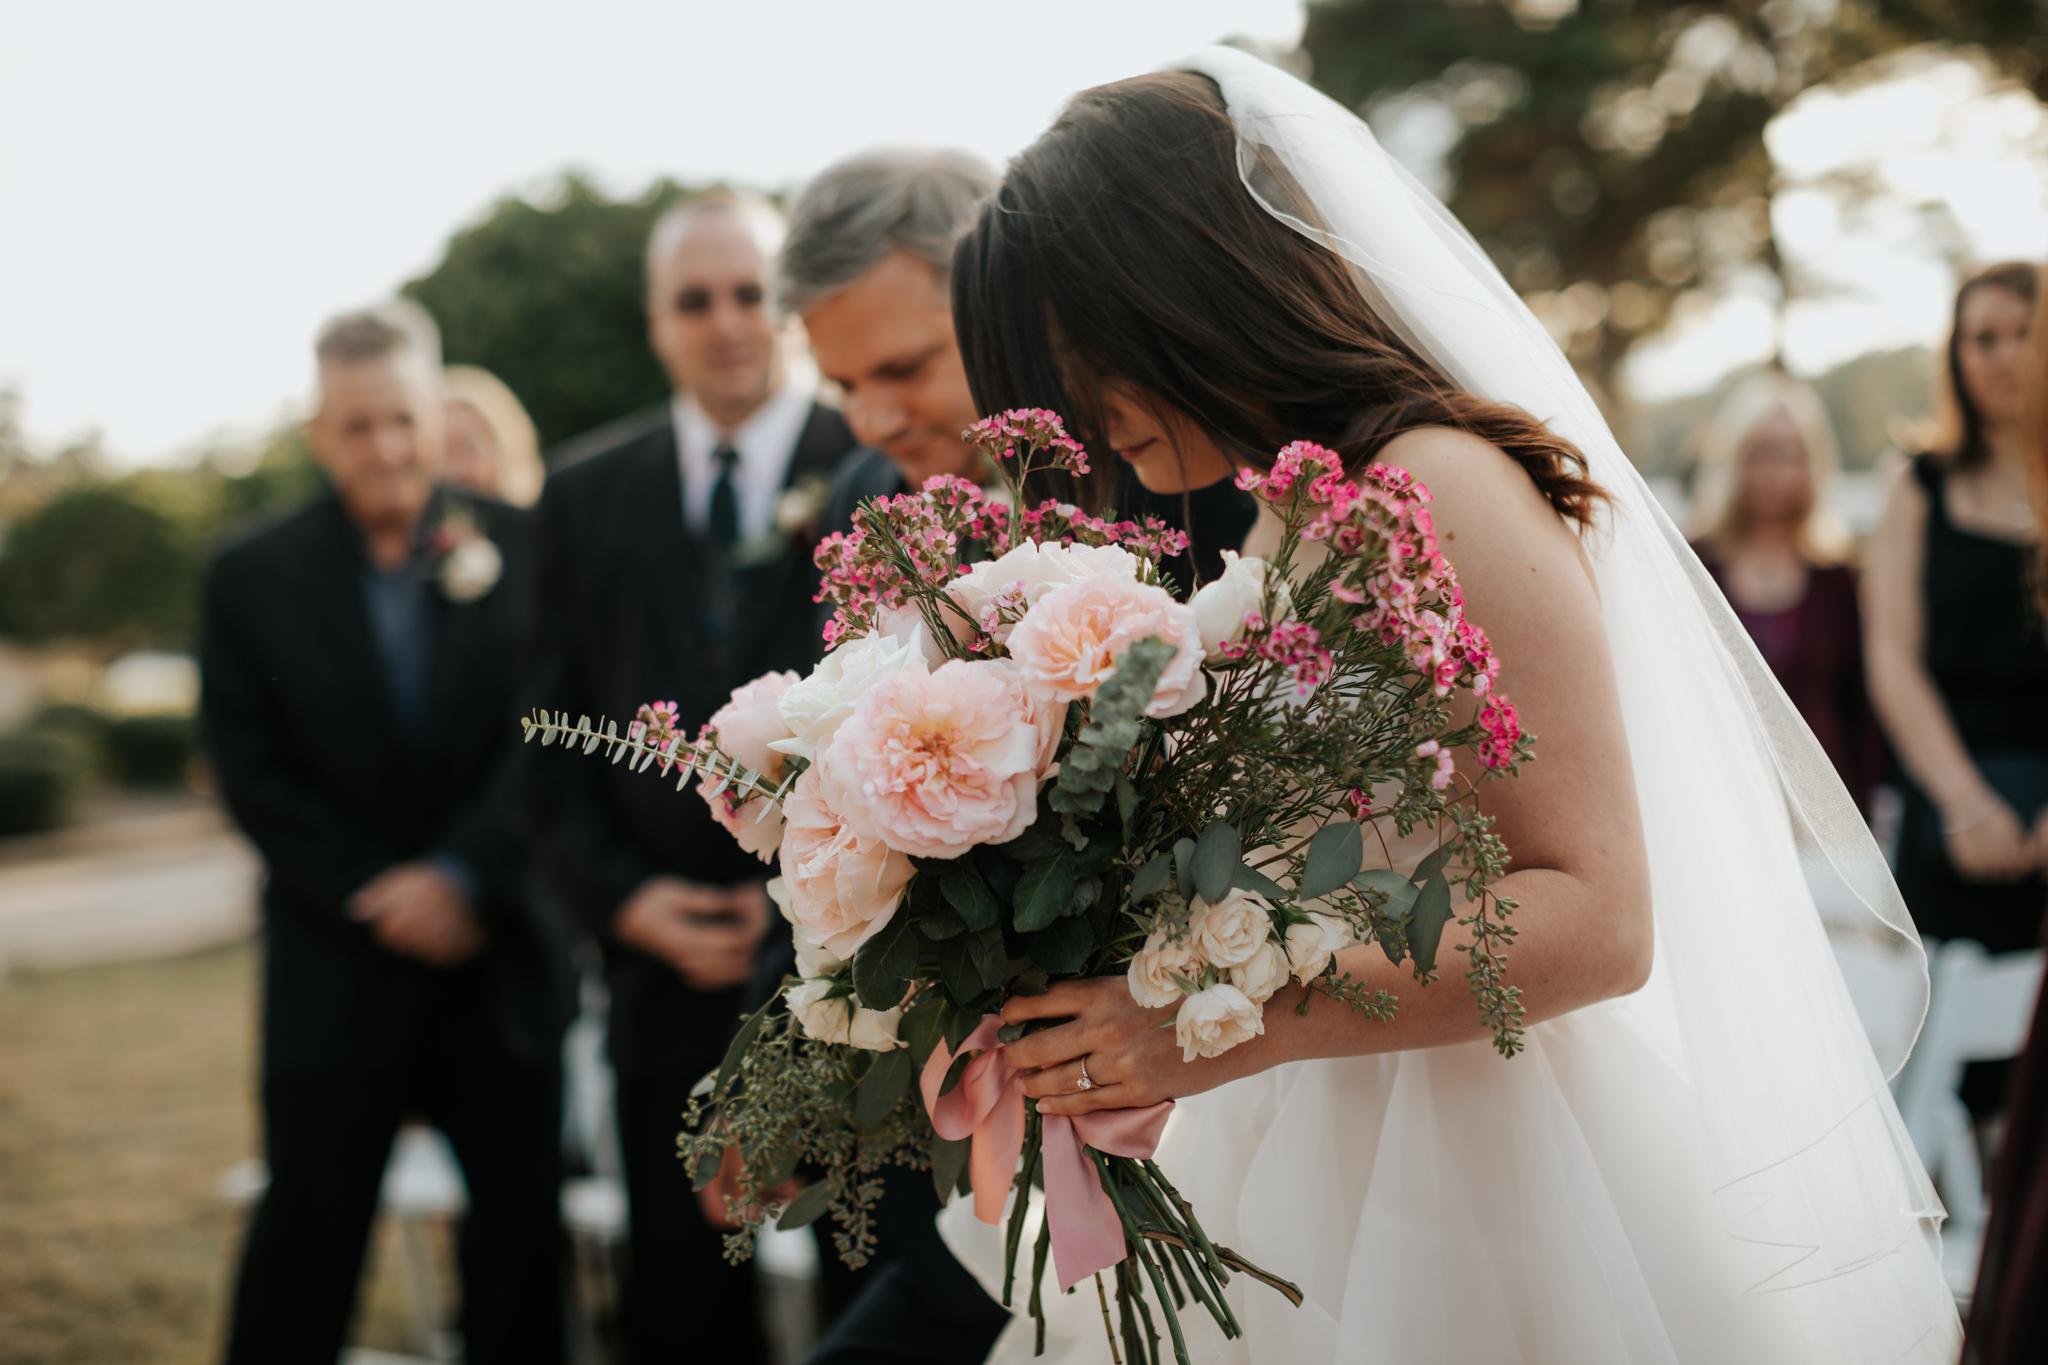 Leah Nicole Photography - Houston Wedding Photographer-Lake Conroe Wedding- Houston Wedding Photographer-29.jpg